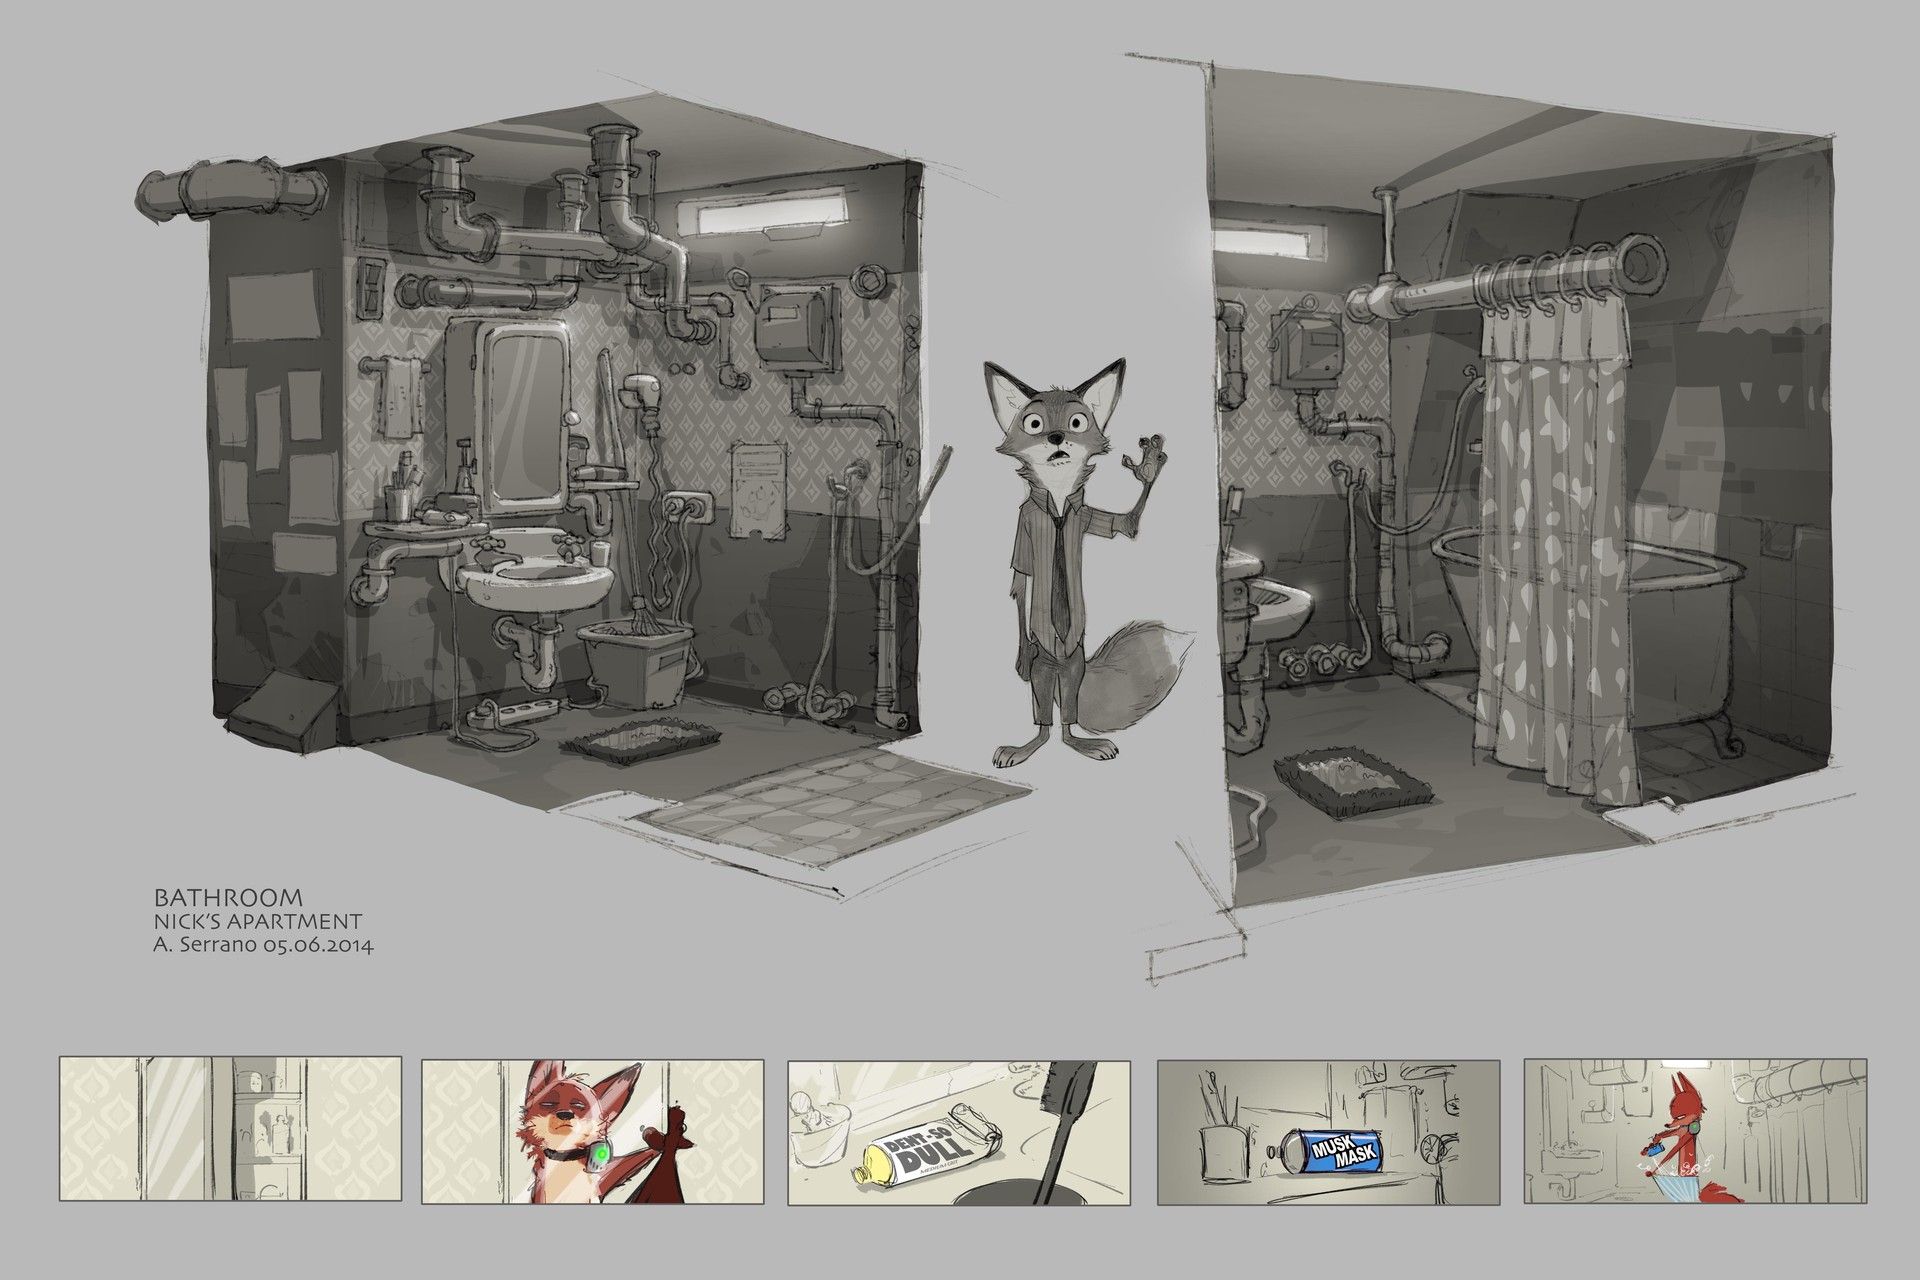 Nick's Bathroom